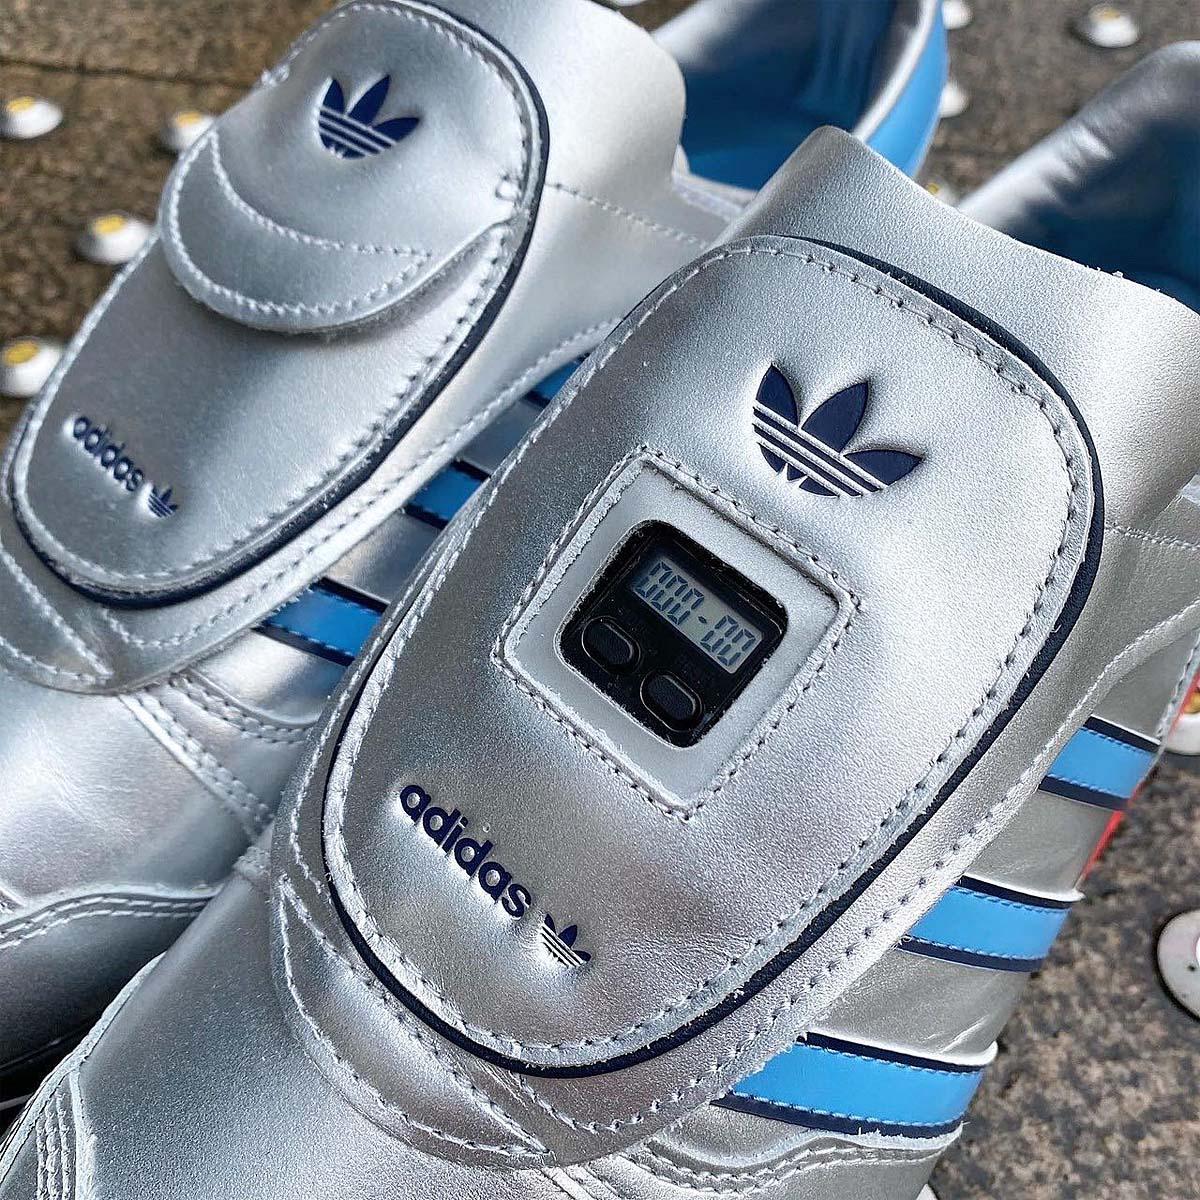 adidas MICROPACER METALLIC SILVER / METALLIC SILVER / LIGHT BLUE FY7687 アディダス マイクロペーサー メタリックシルバー/ライトブルー